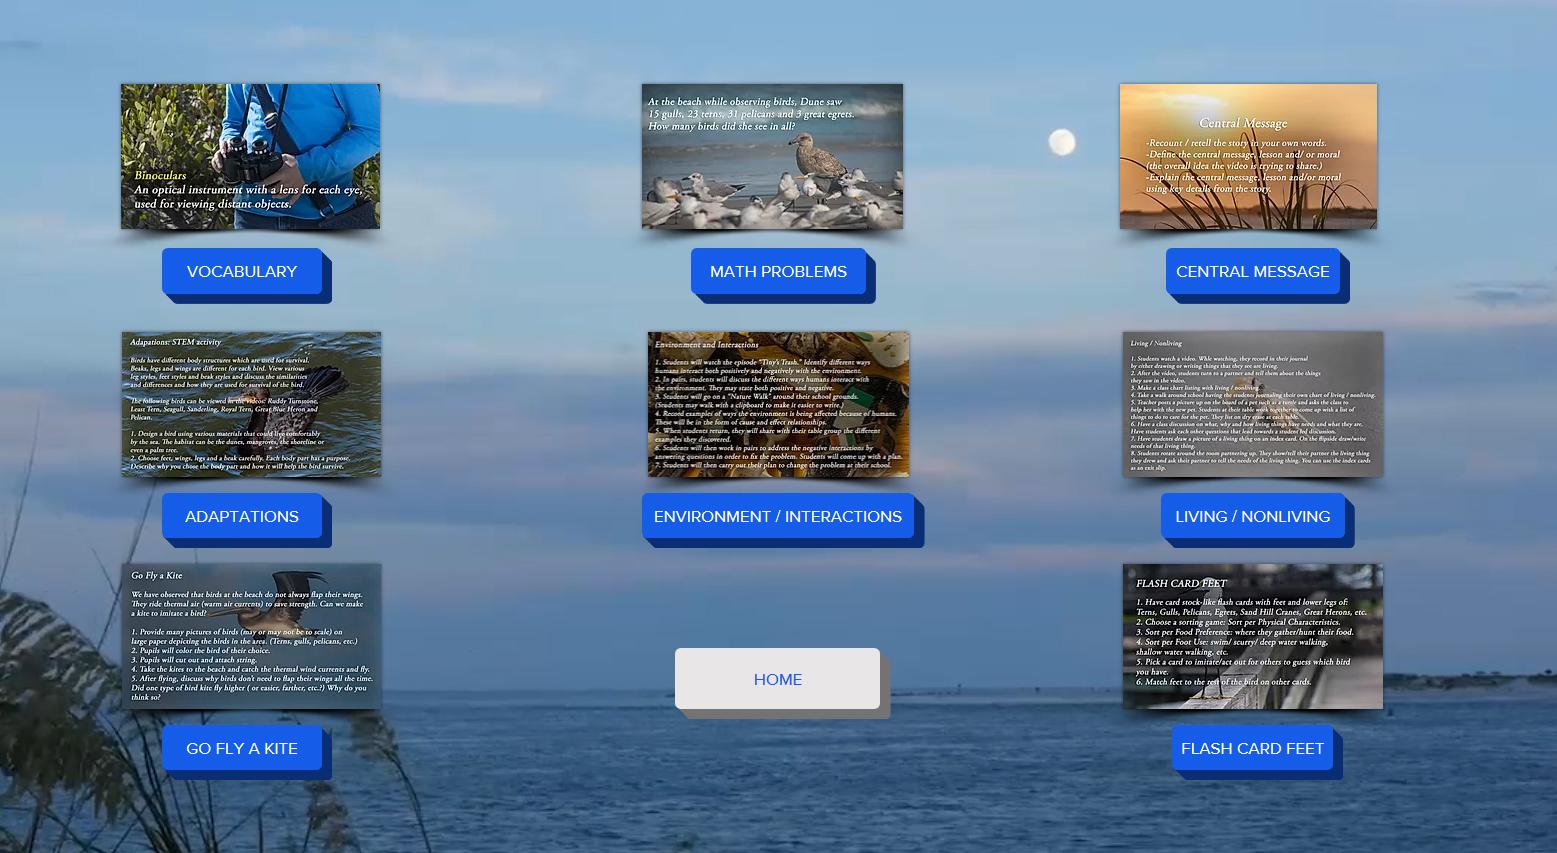 Dune's Island_Website Curriculum Image.jpg